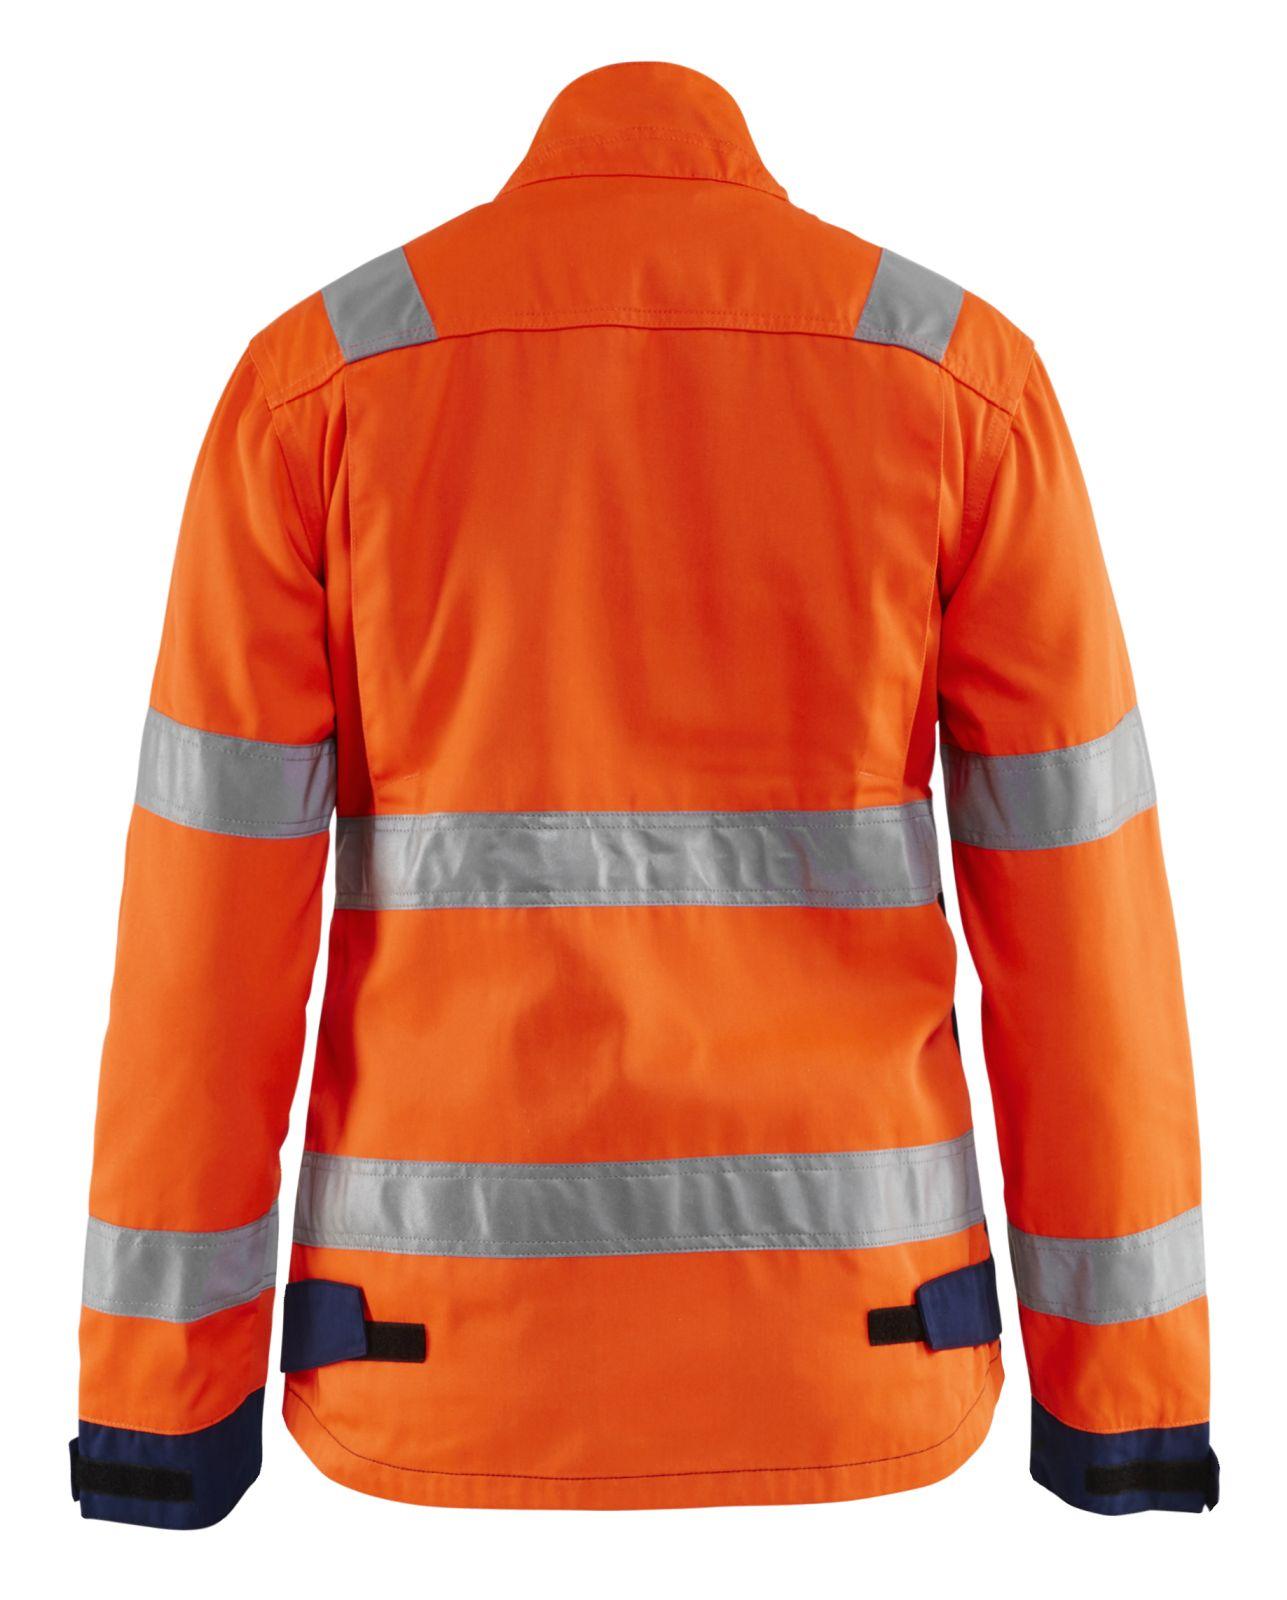 Blaklader Dames werkjacks 49031811 High Vis oranje-marineblauw(5389)